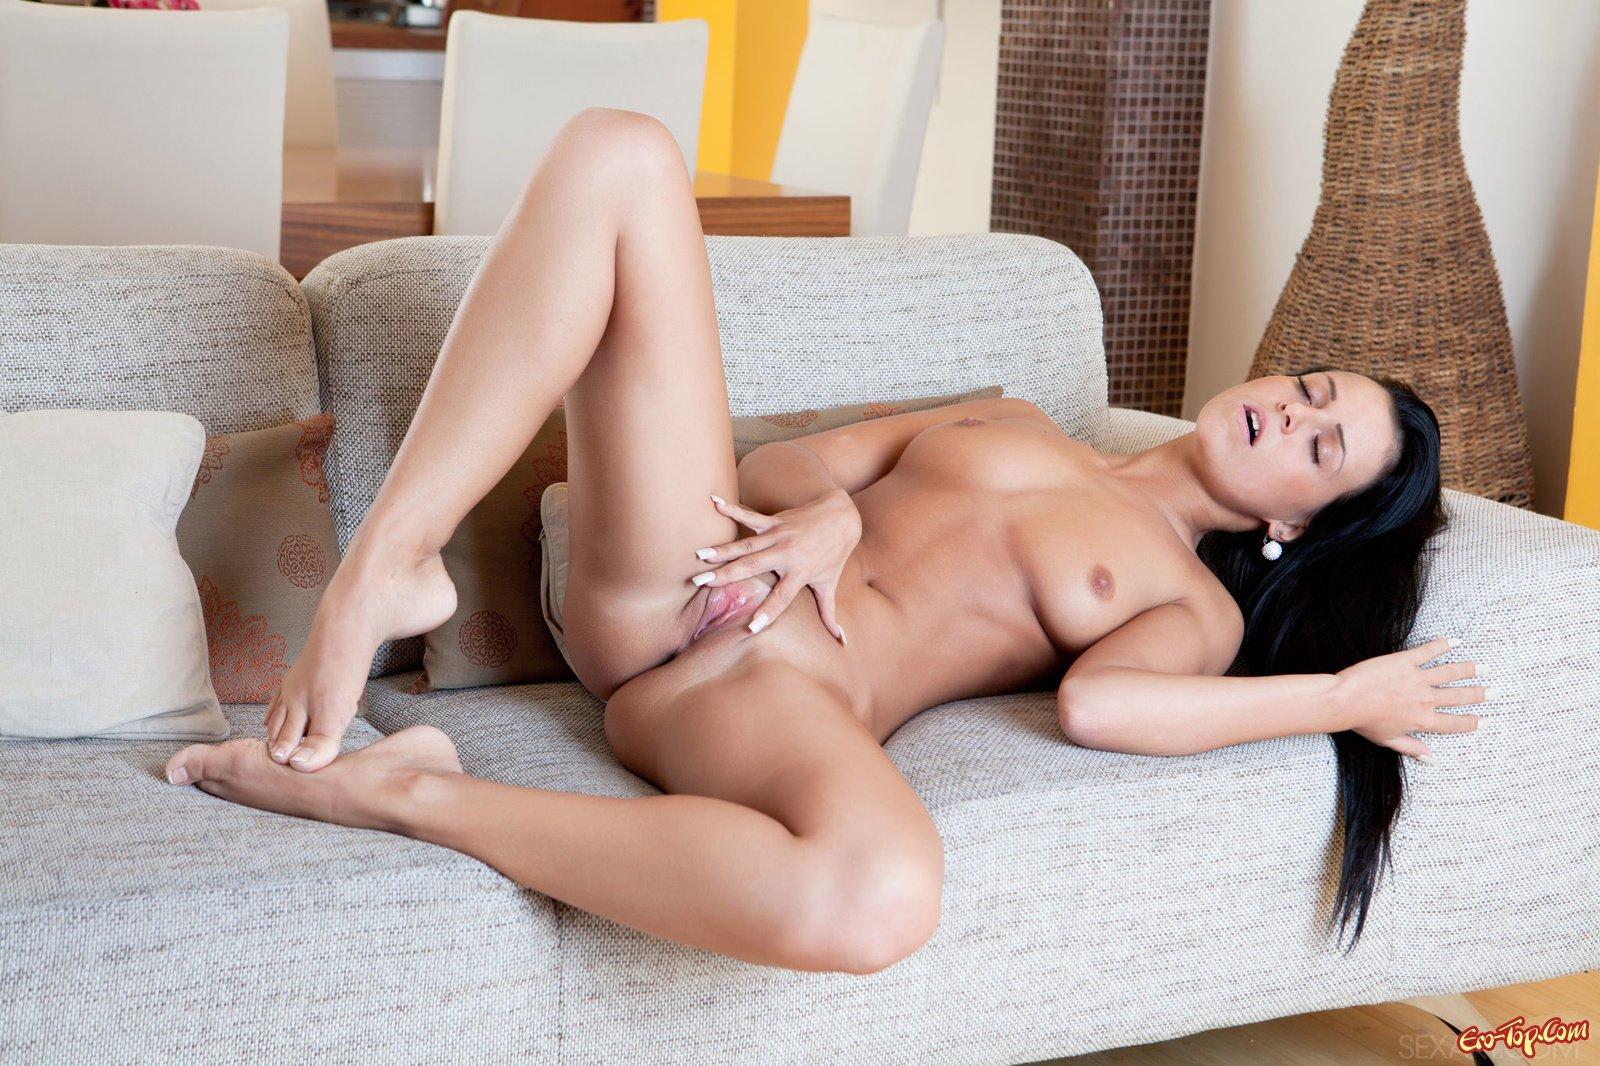 Брюнетка расставляет ноги дома на диване